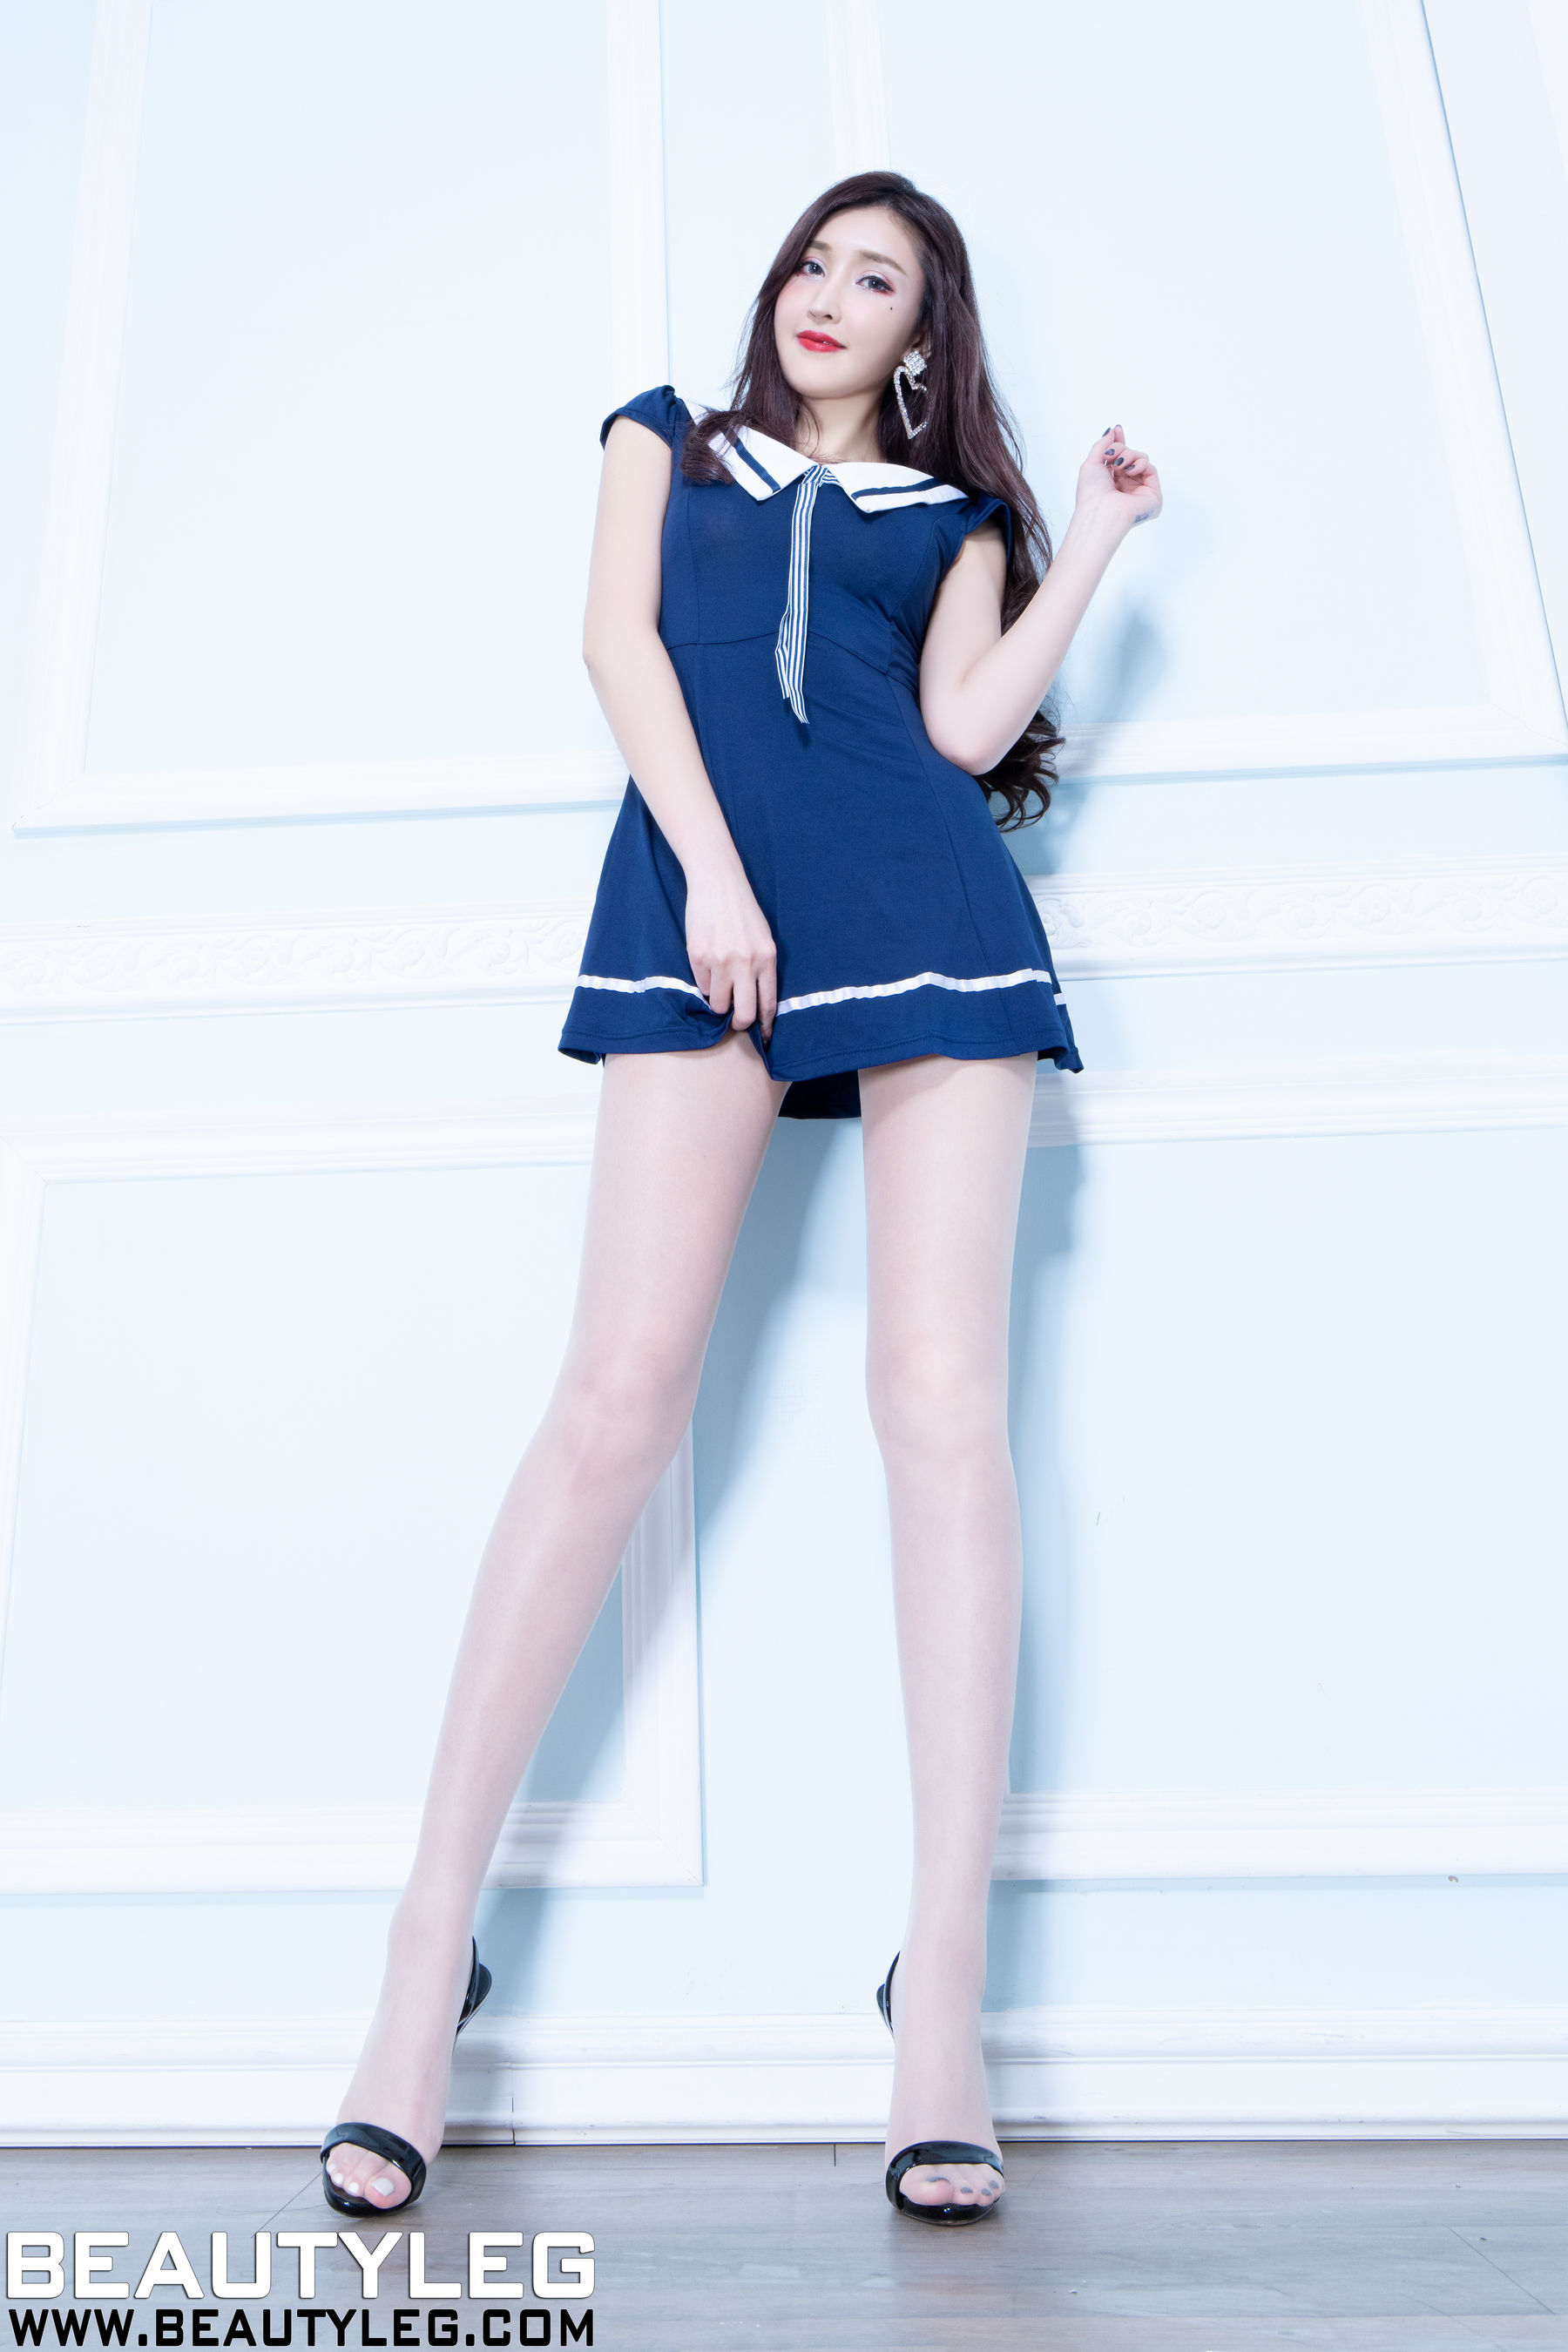 VOL.805 [Beautyleg]丝袜美腿:任育萱(腿模Vanessa)超高清个人性感漂亮大图(45P)